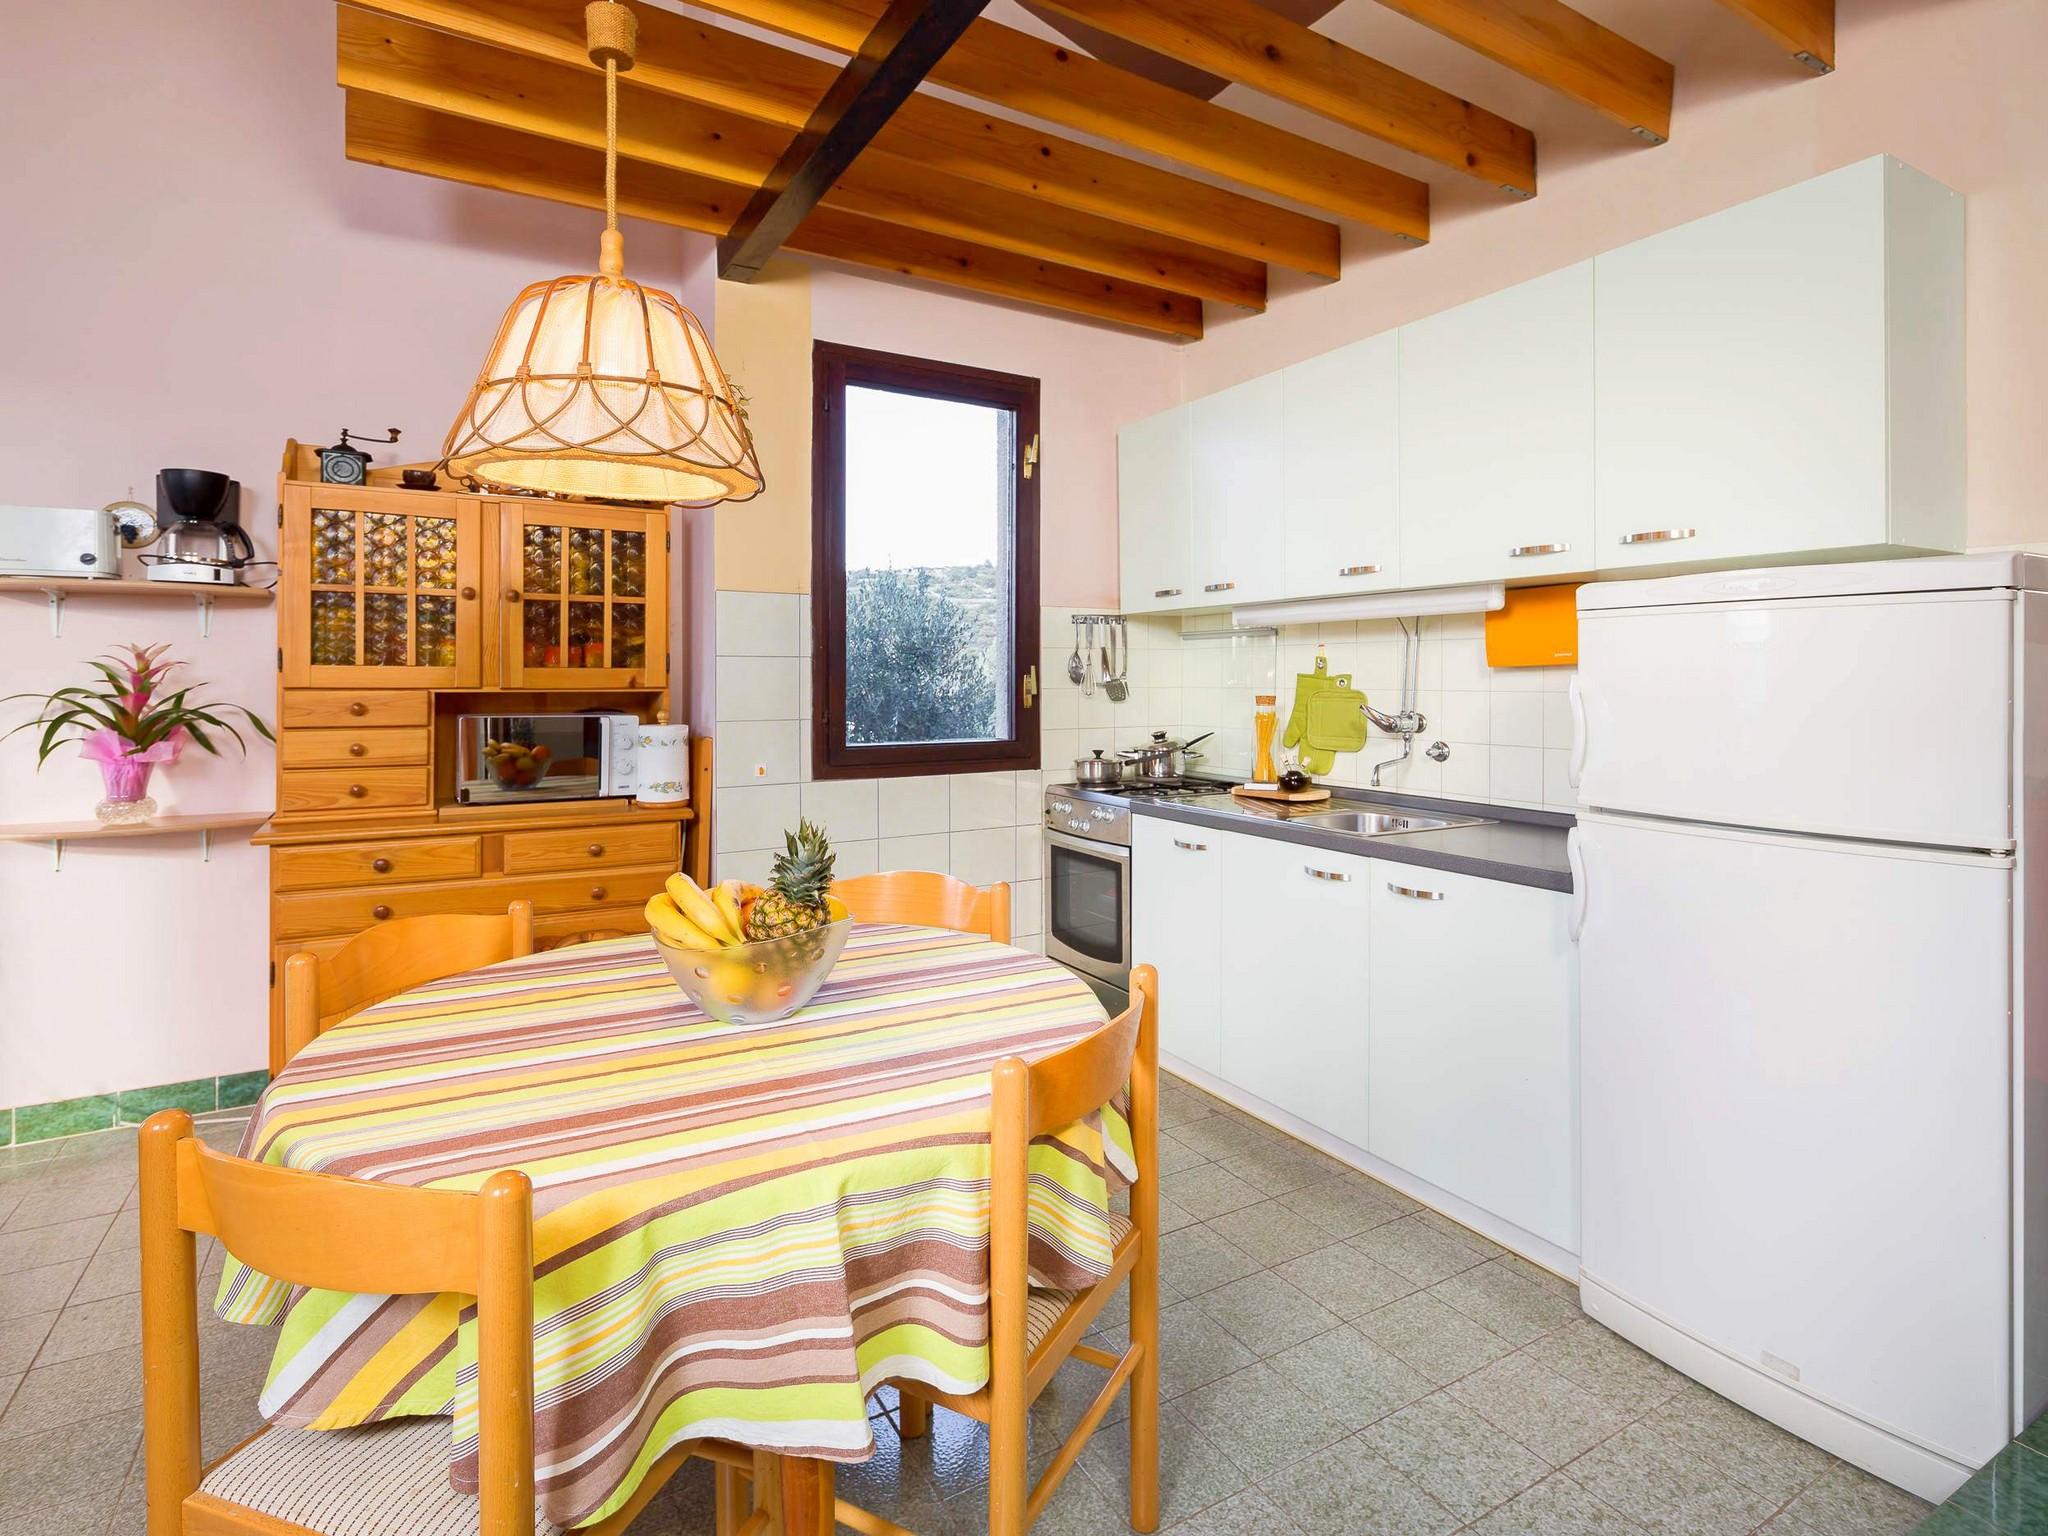 Ferienhaus Tanja, Kua K6+2 (940510), Kanica, , Dalmatien, Kroatien, Bild 24